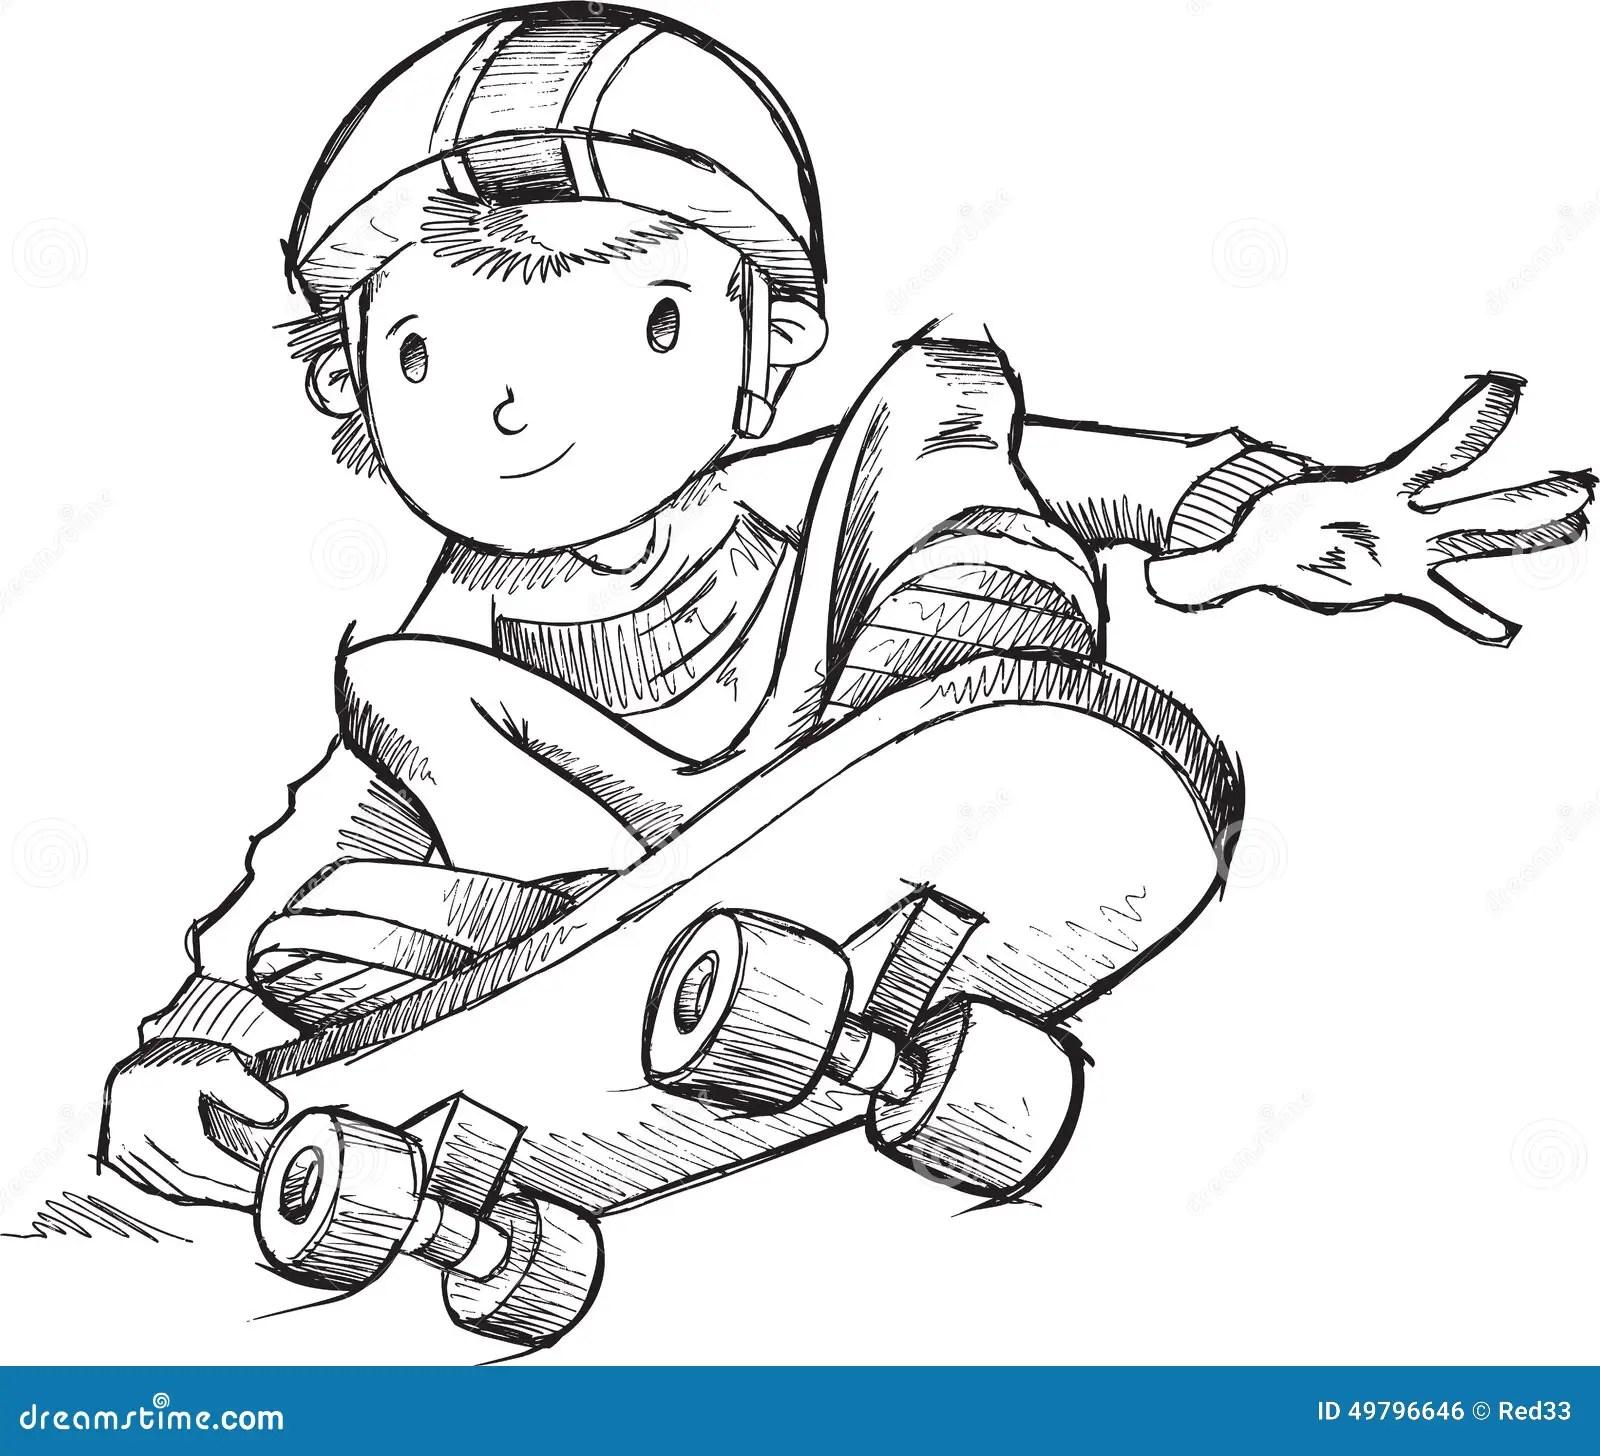 Skateboarder Doodle Vector Stock Vector Image Of Children